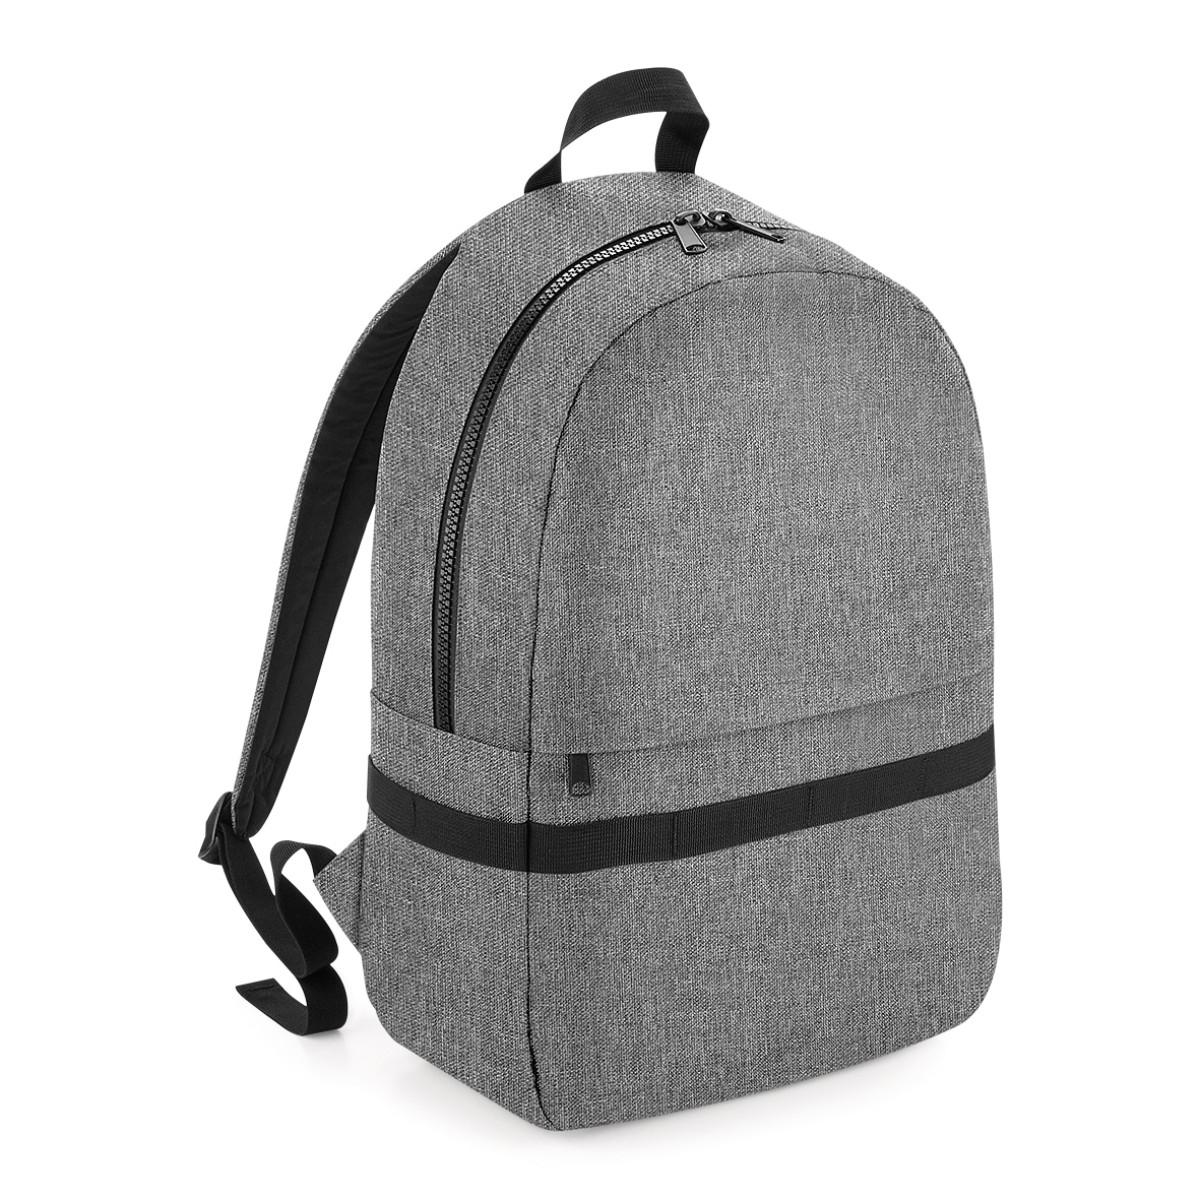 Bagbase Modulr 20 Litre Backpack